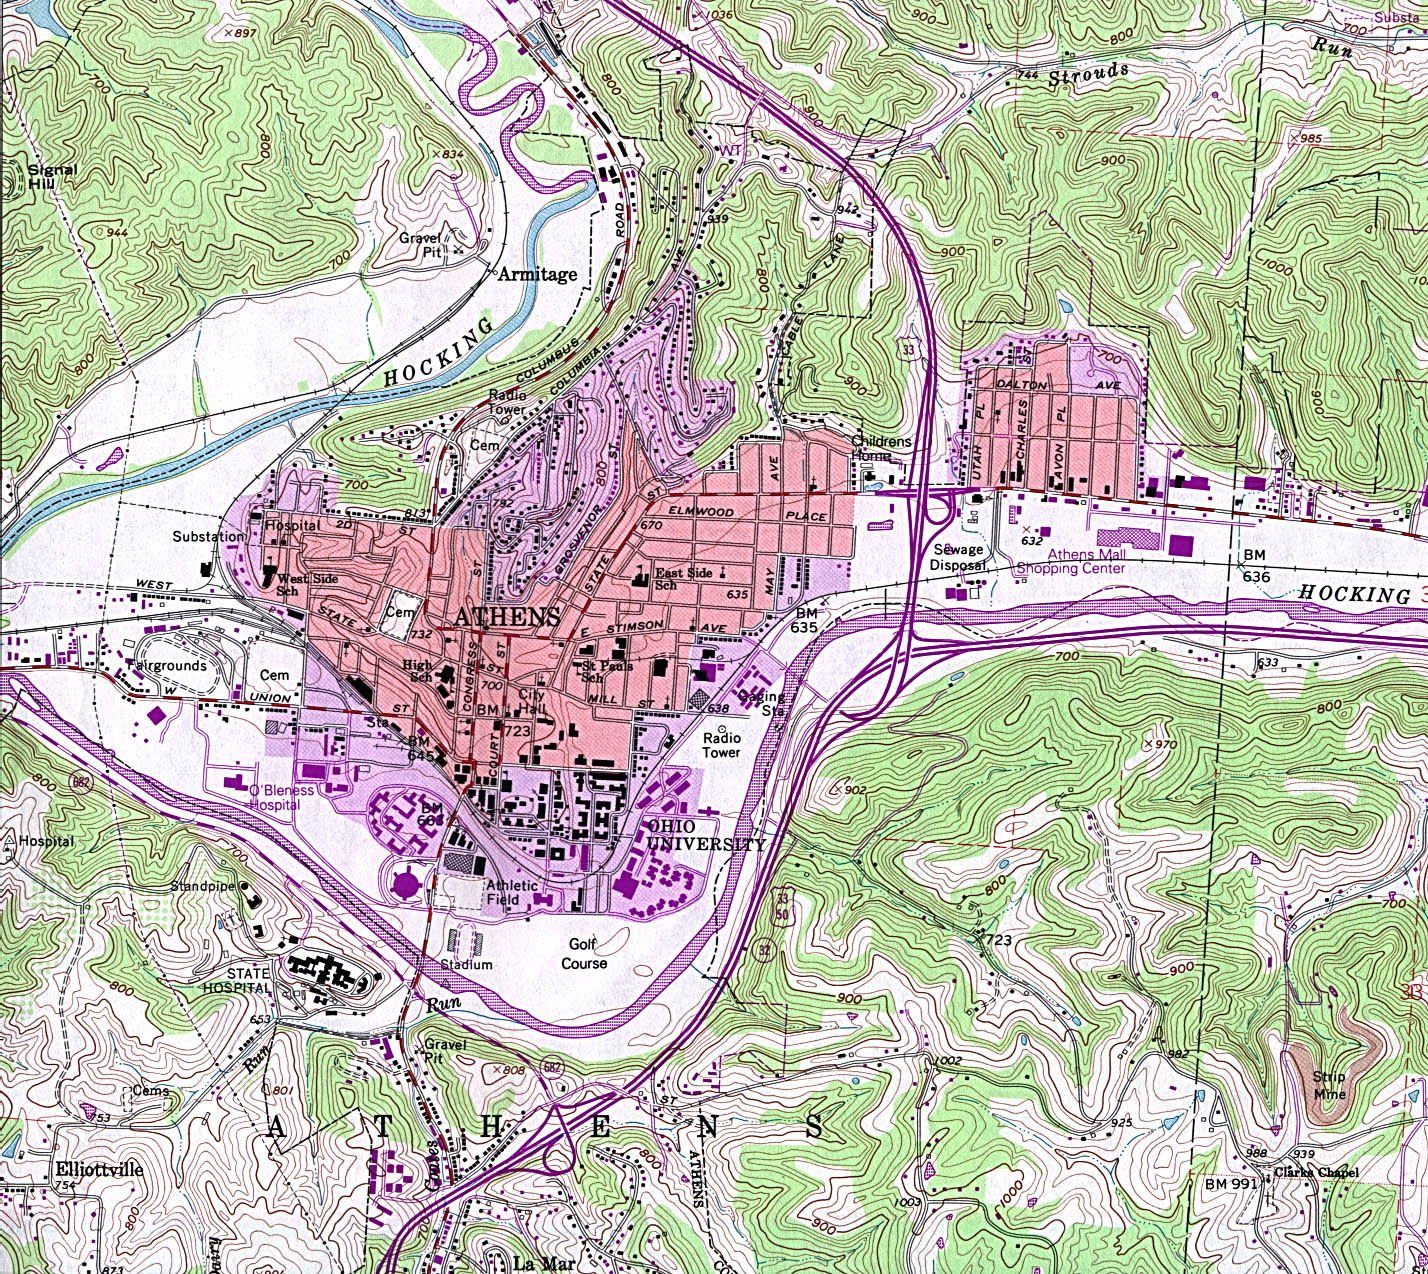 Athens Topographic City Map, Ohio, United States